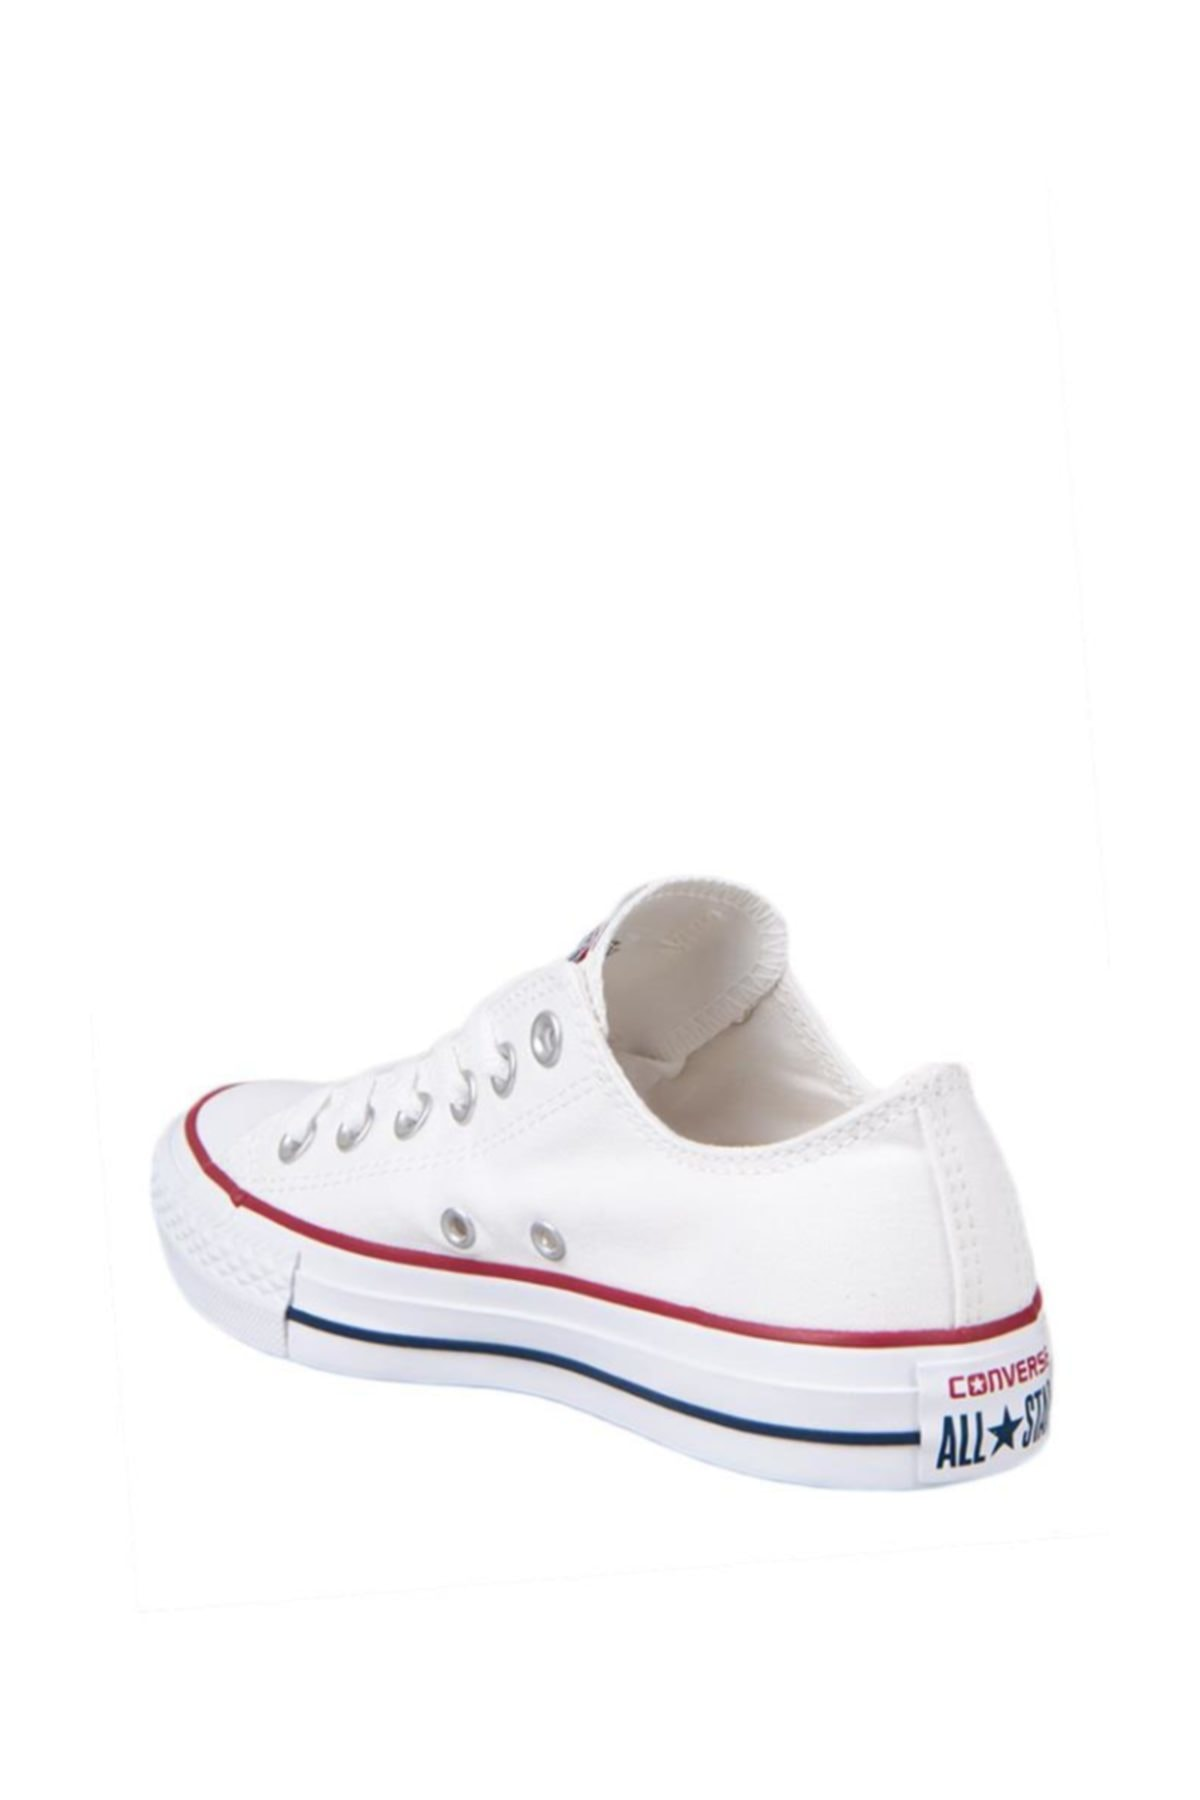 converse Chuck Taylor All Star Ayakkabı Beyaz Renk - M7652c 2